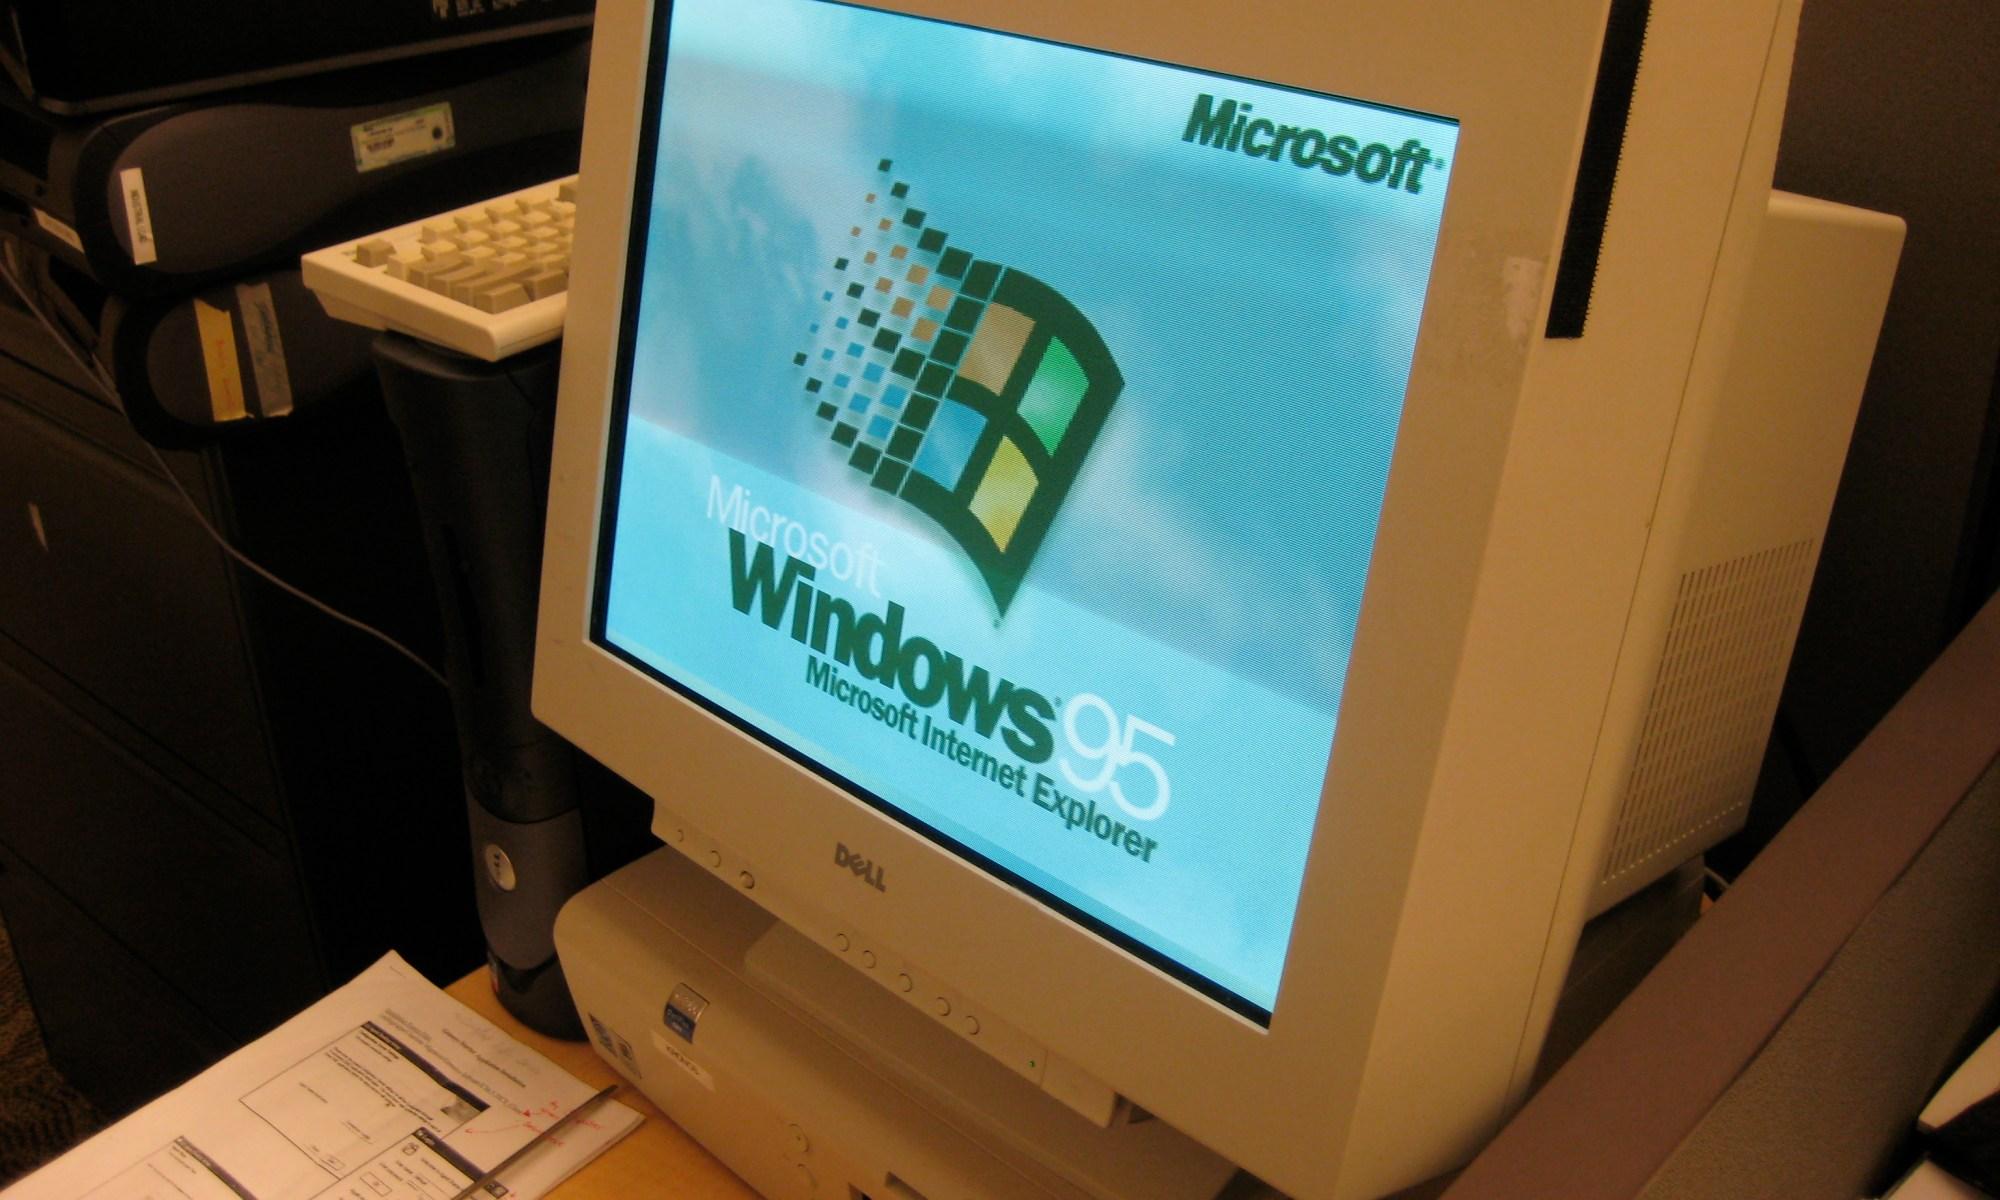 Windows 95 computer with a CRT moniitor